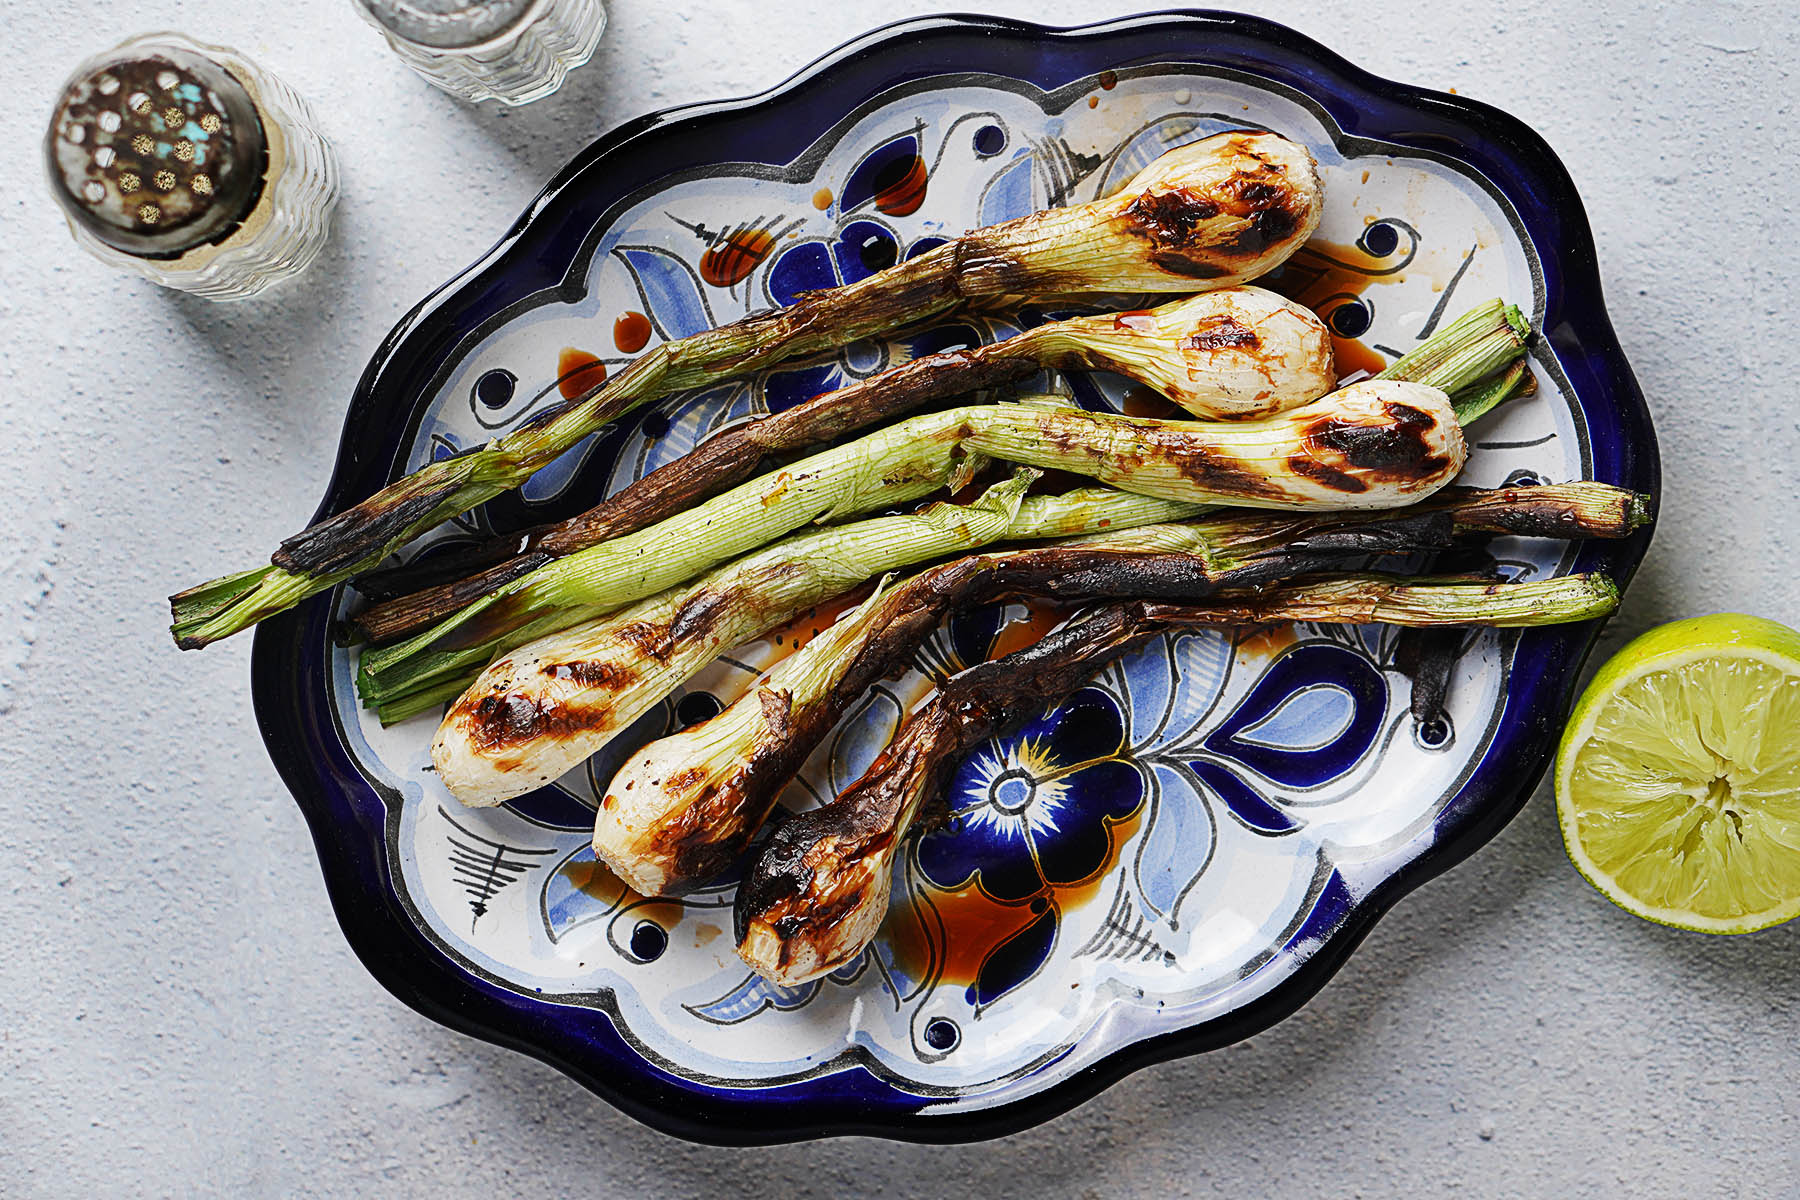 Cebollitas asadas on a blue plate with a lime on the side